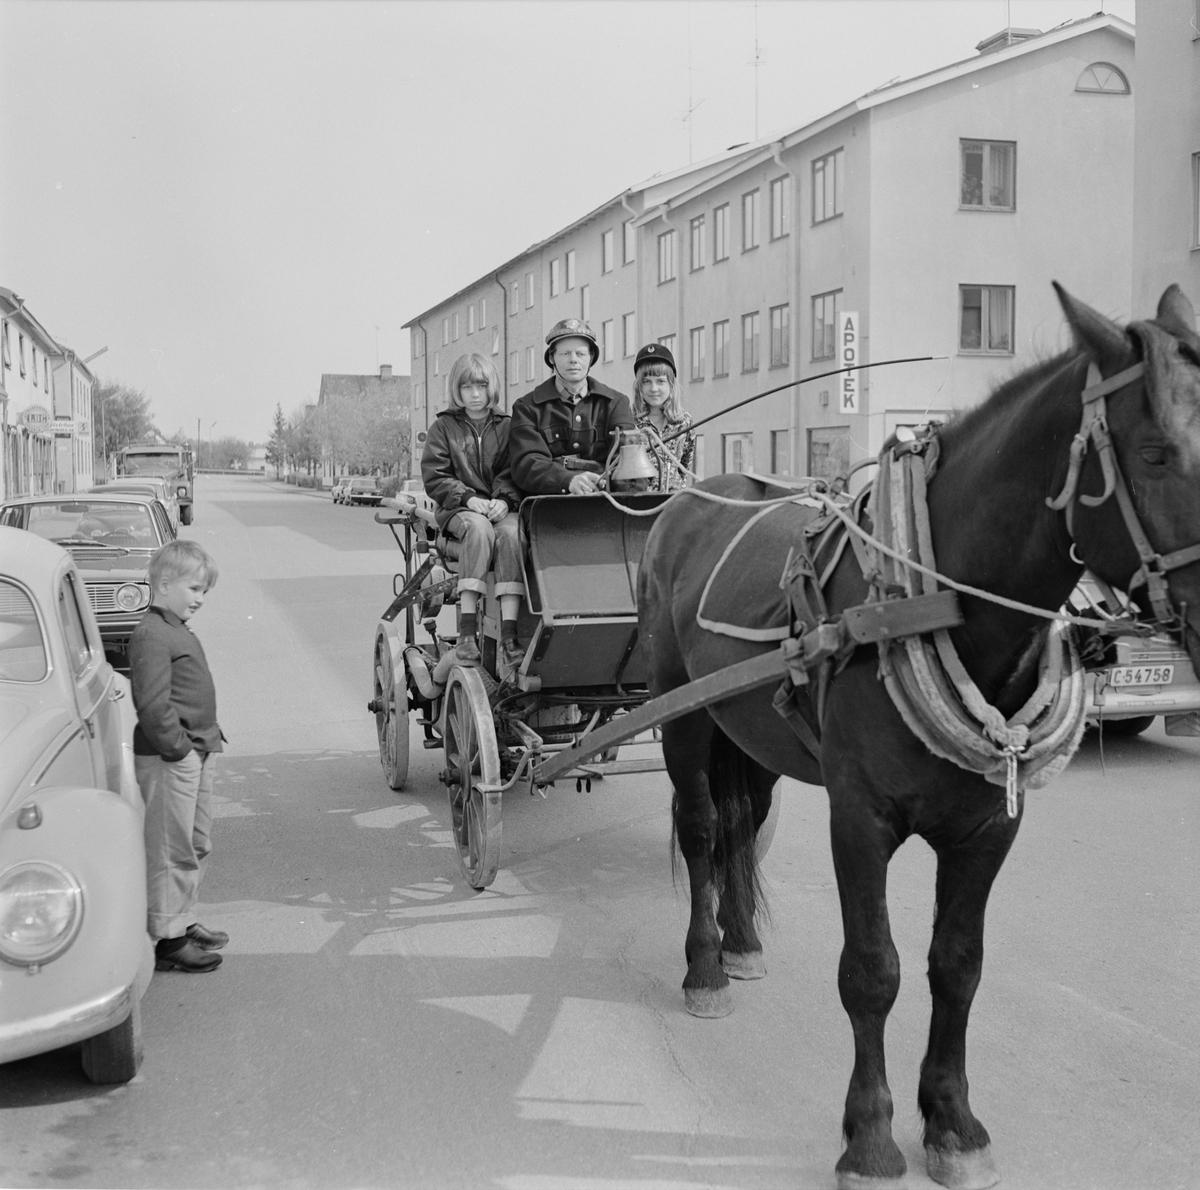 Barnens dag, Tierp, Uppland, maj 1968